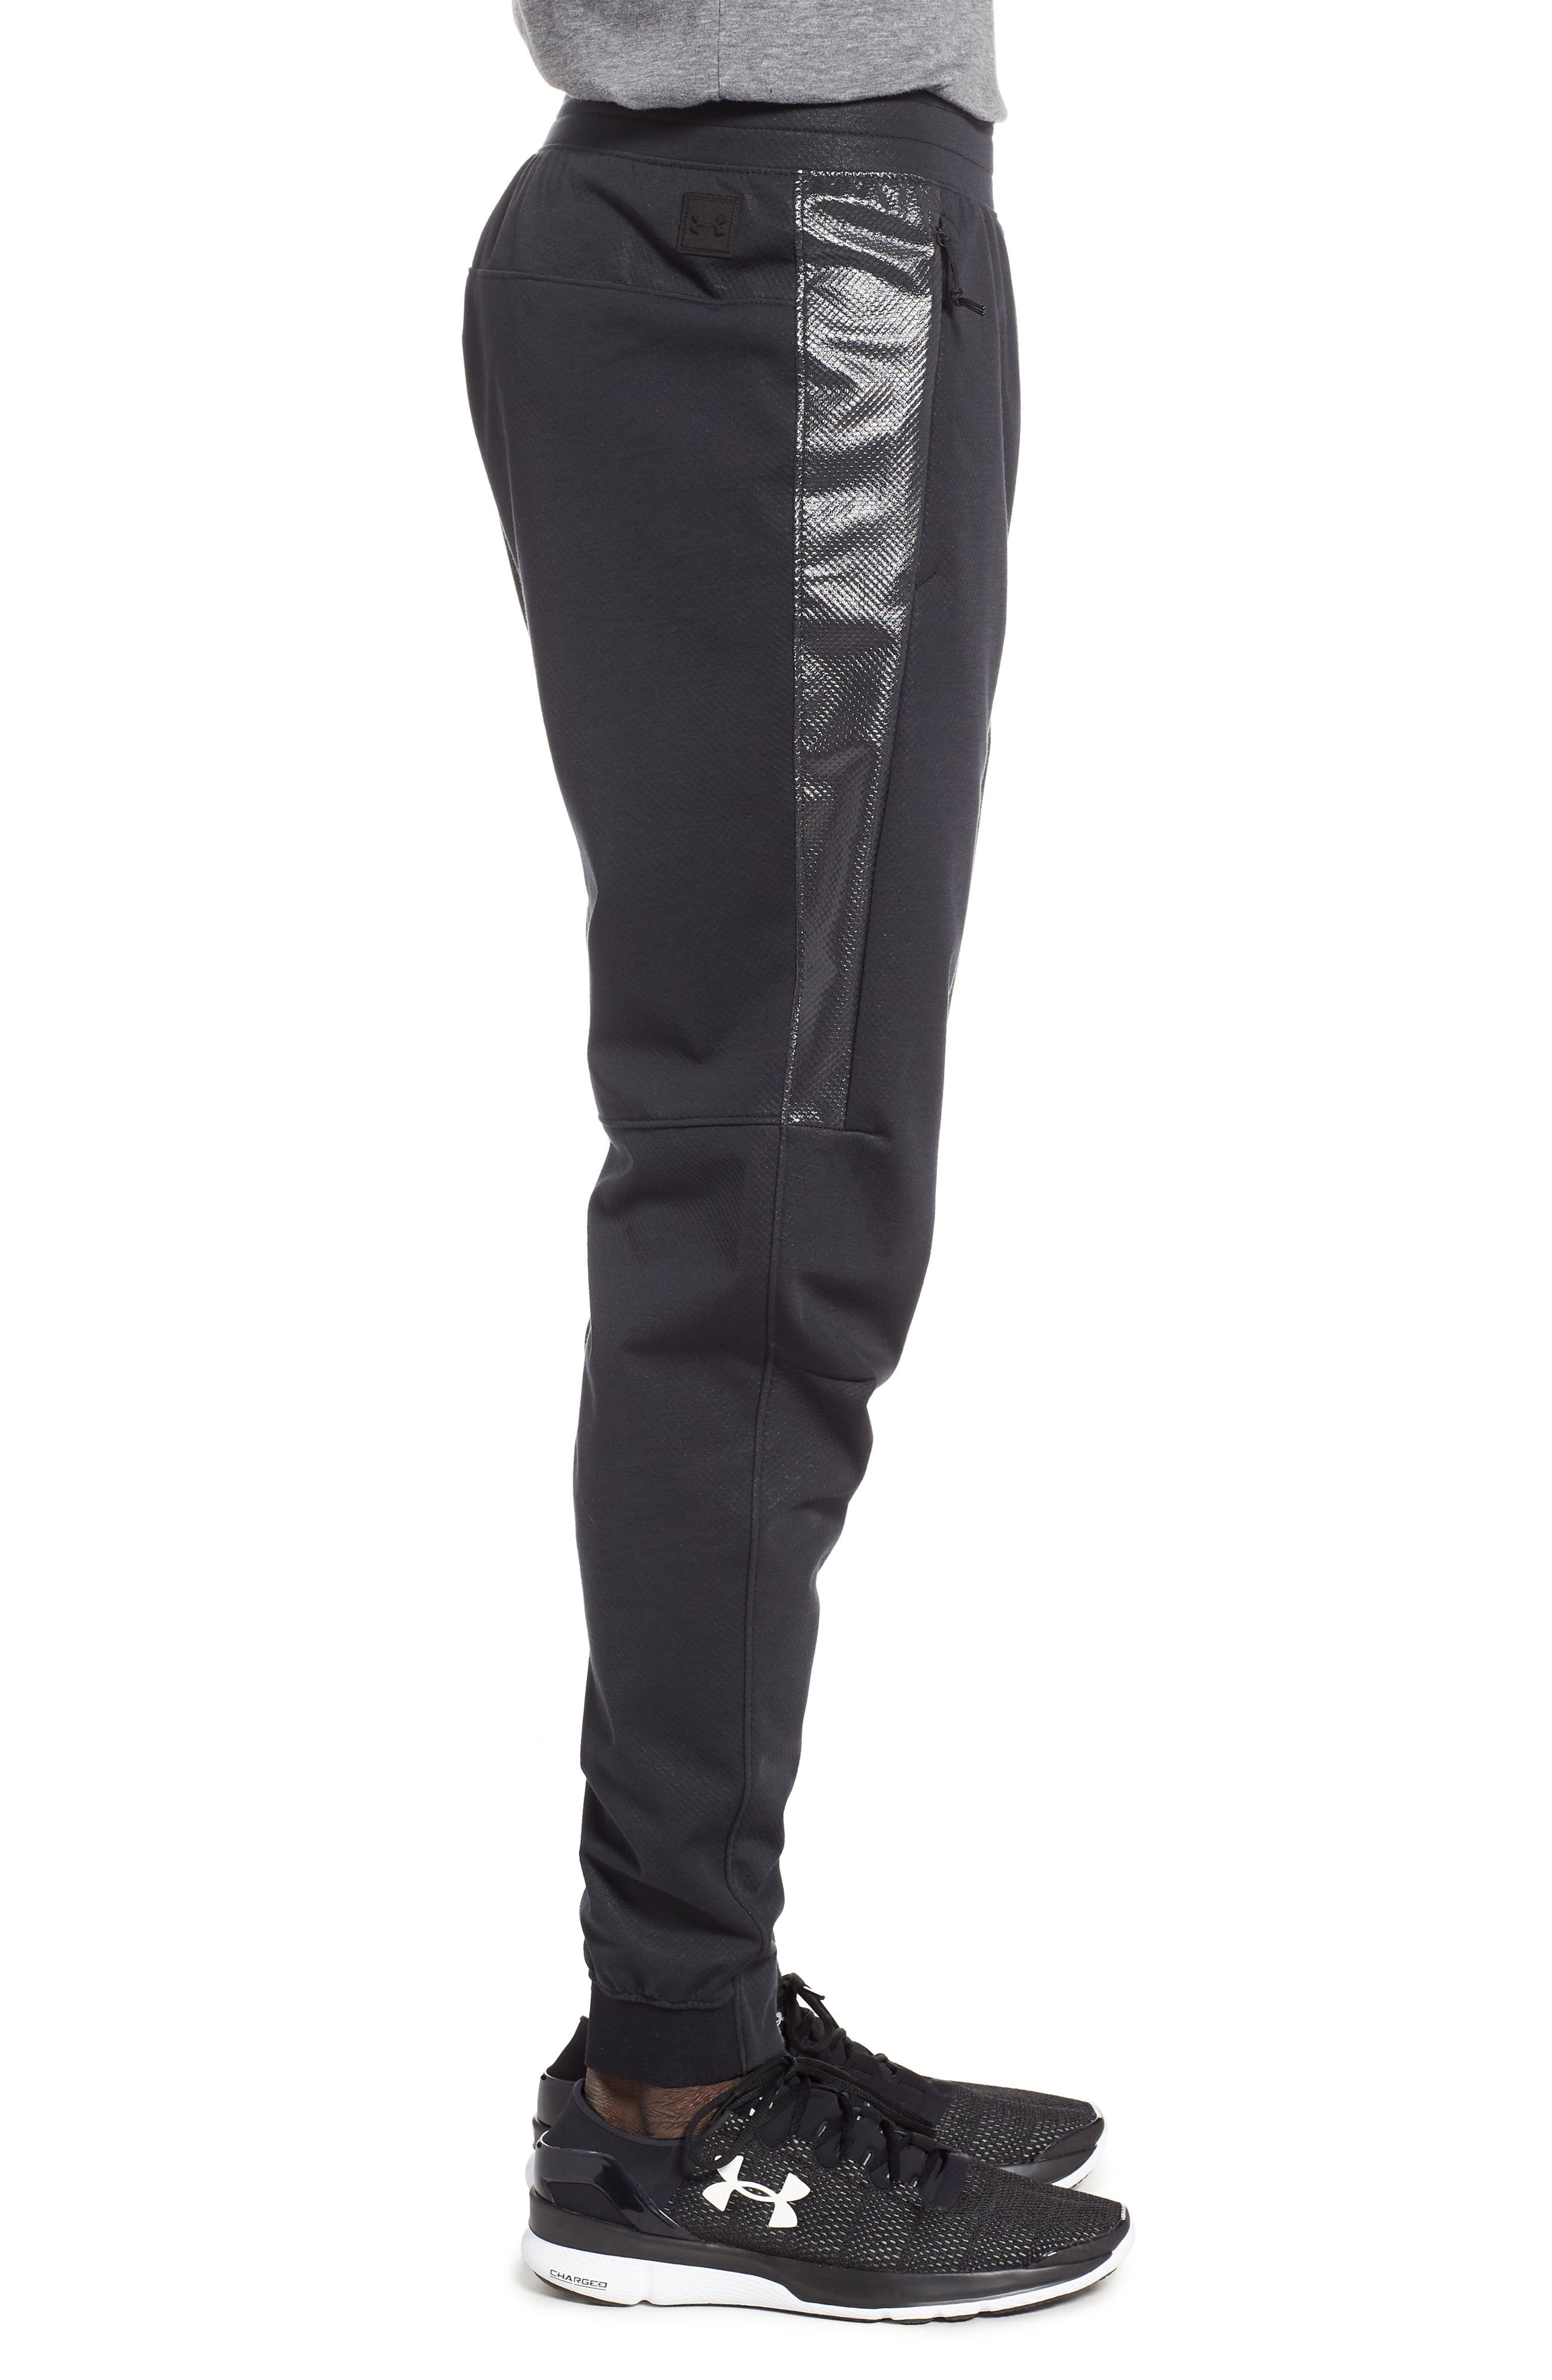 Unstoppable Swacket Training Pants,                             Alternate thumbnail 3, color,                             BLACK FULL HEATHER/ BLACK